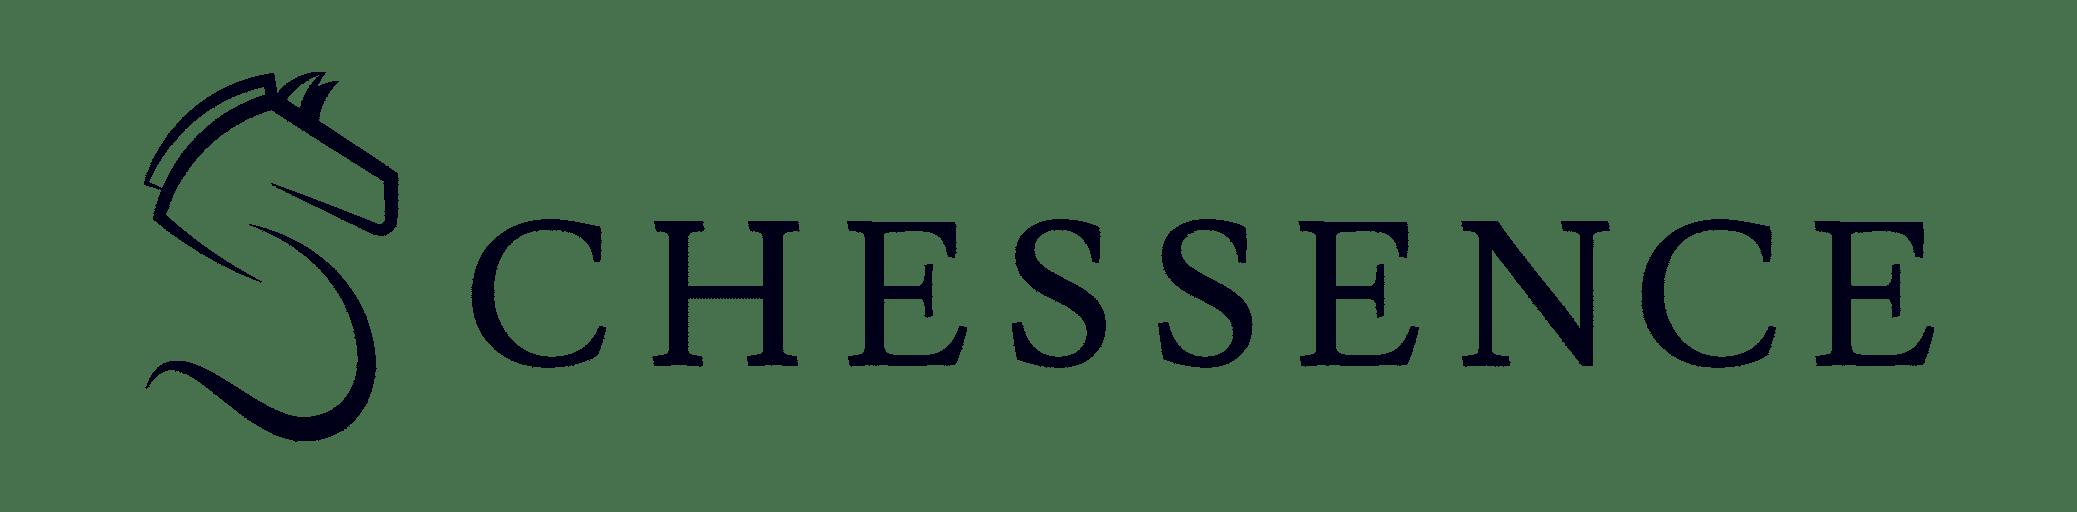 Chessence_Logo_512px_Margin